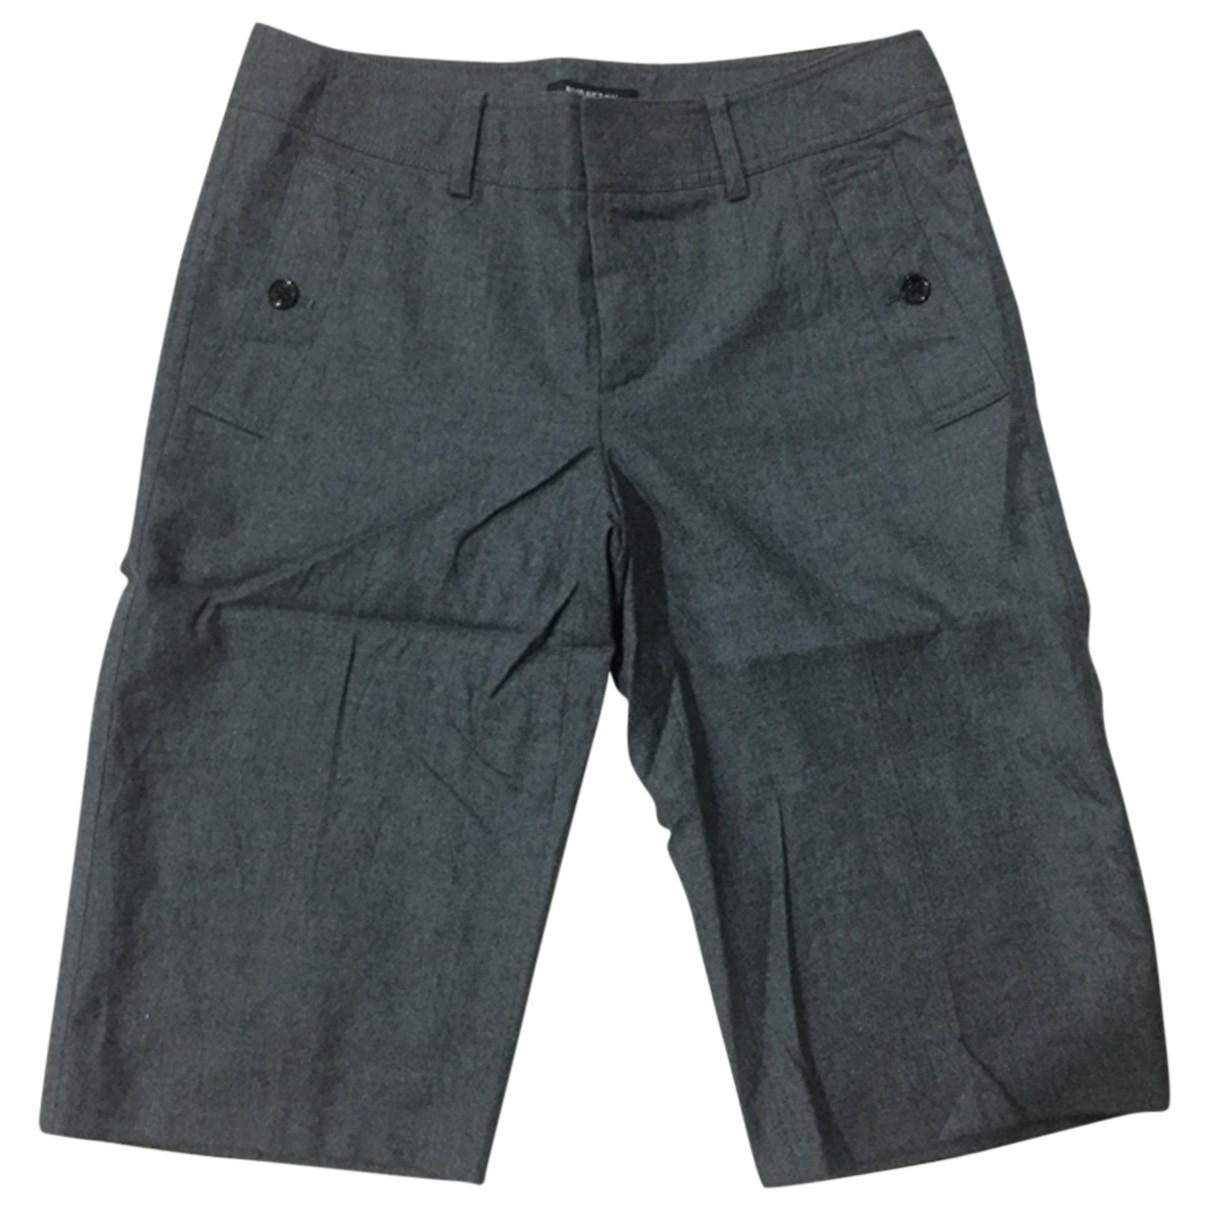 Burberry \N Shorts in  Grau Baumwolle